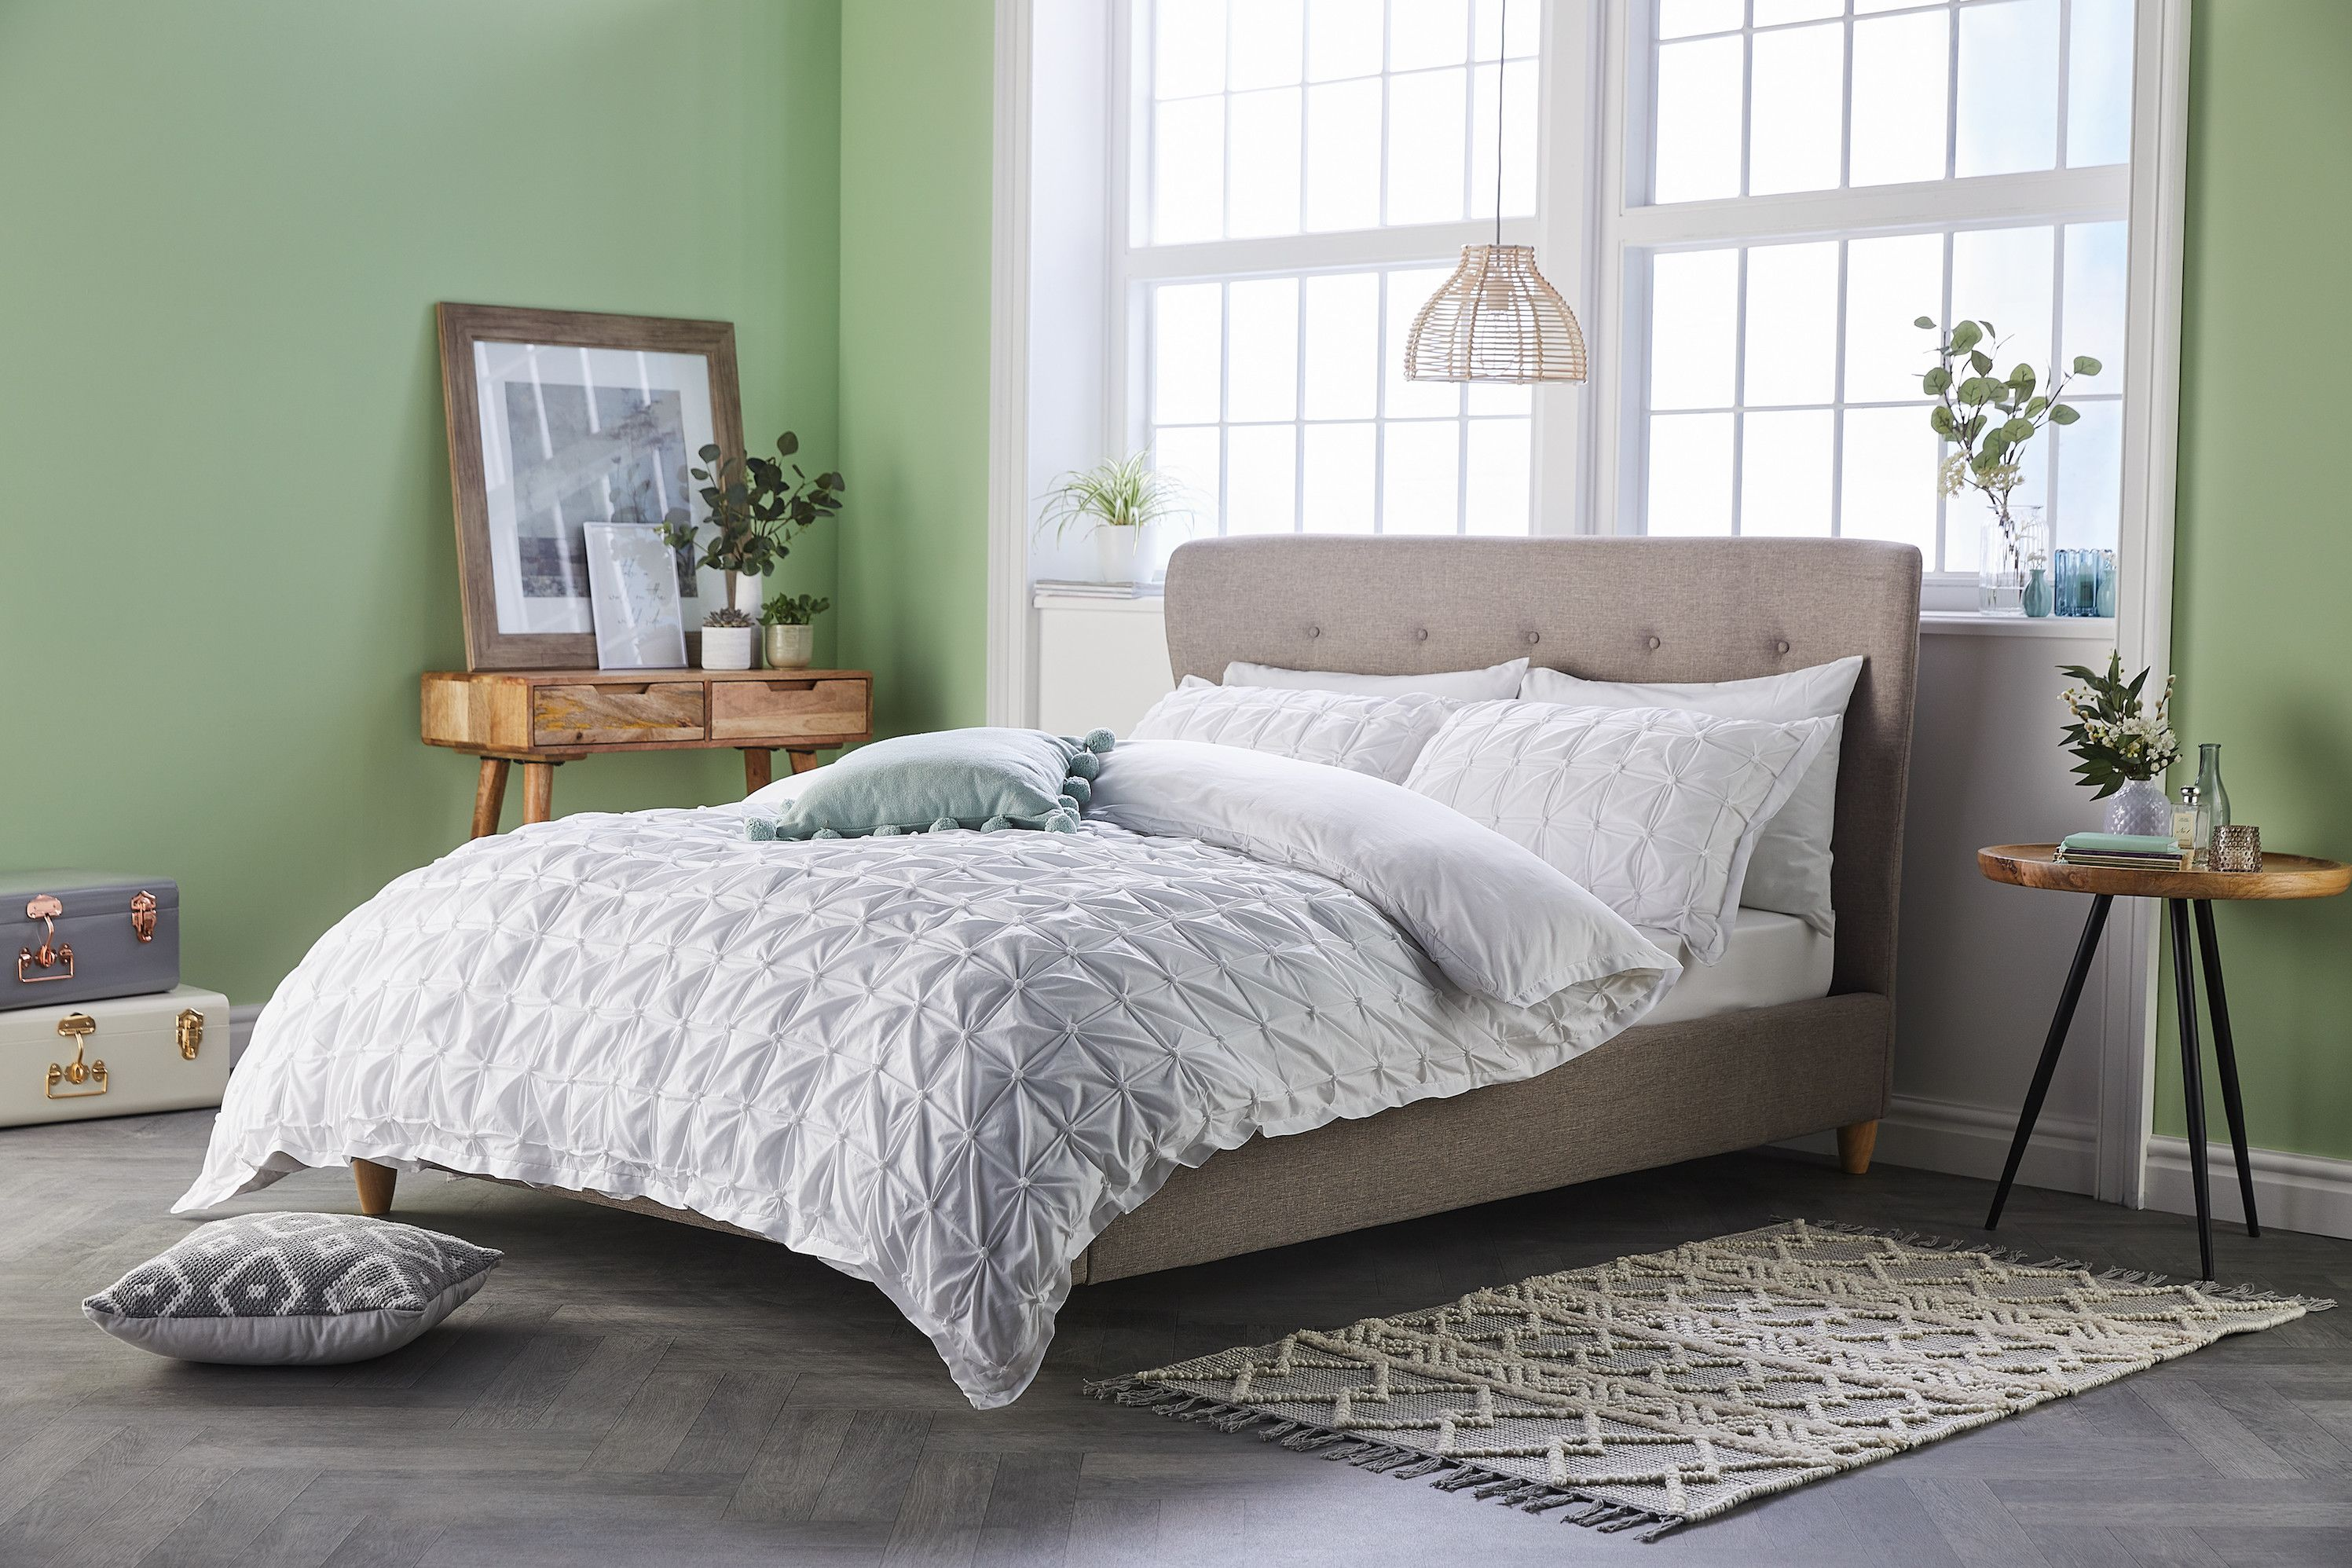 Grey Easy Care Pillow Case 4 Pack ALDI UK